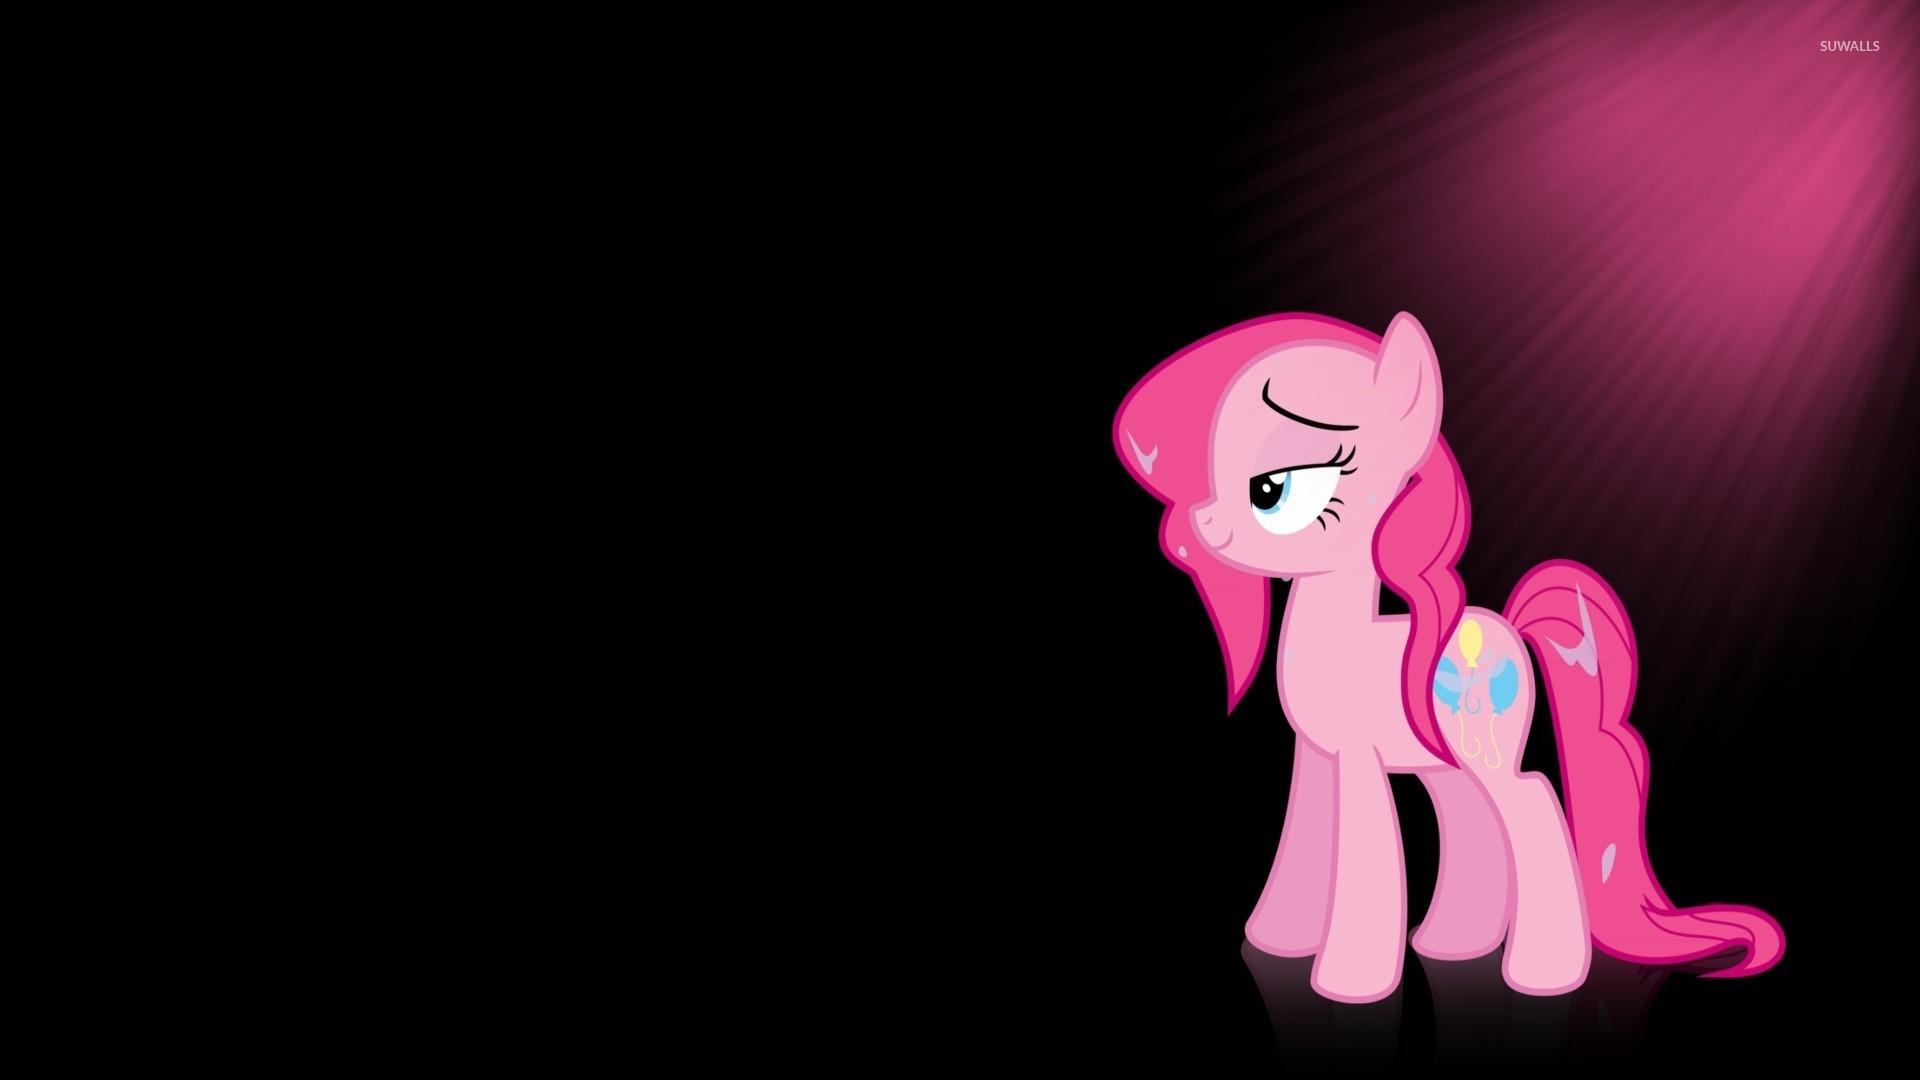 Sun light upon Pinkie Pie – My Little Pony wallpaper jpg